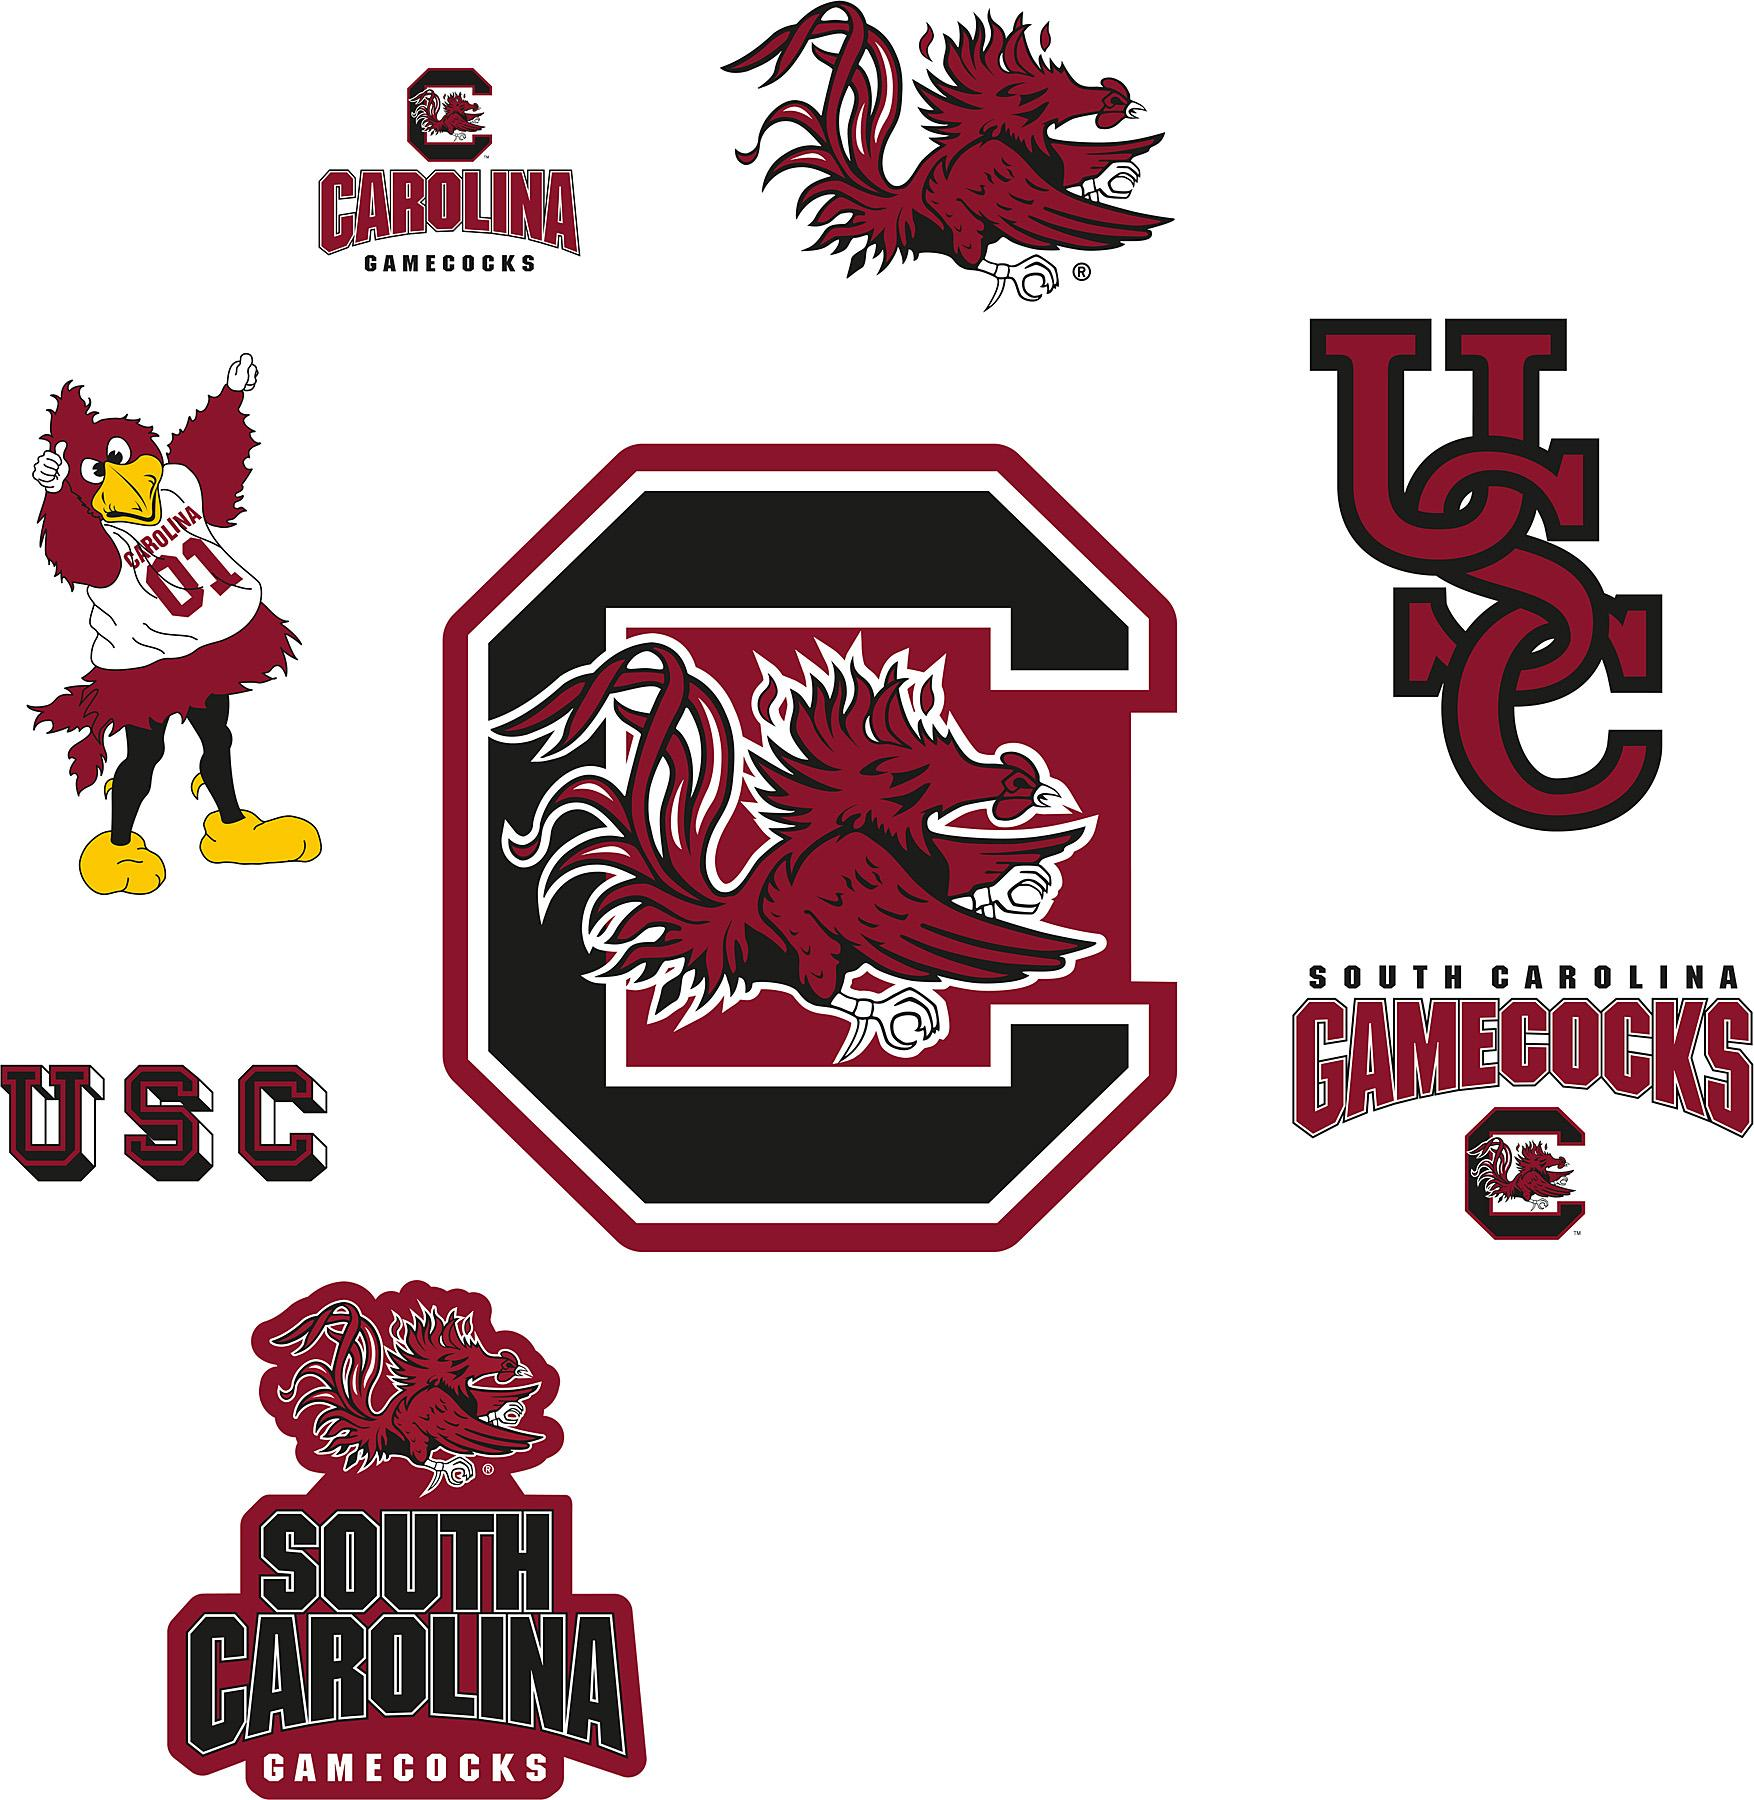 06c92e6fdc271 Brewster Wallcovering South Carolina Gamecocks Logo Fathead Jr Search  Results